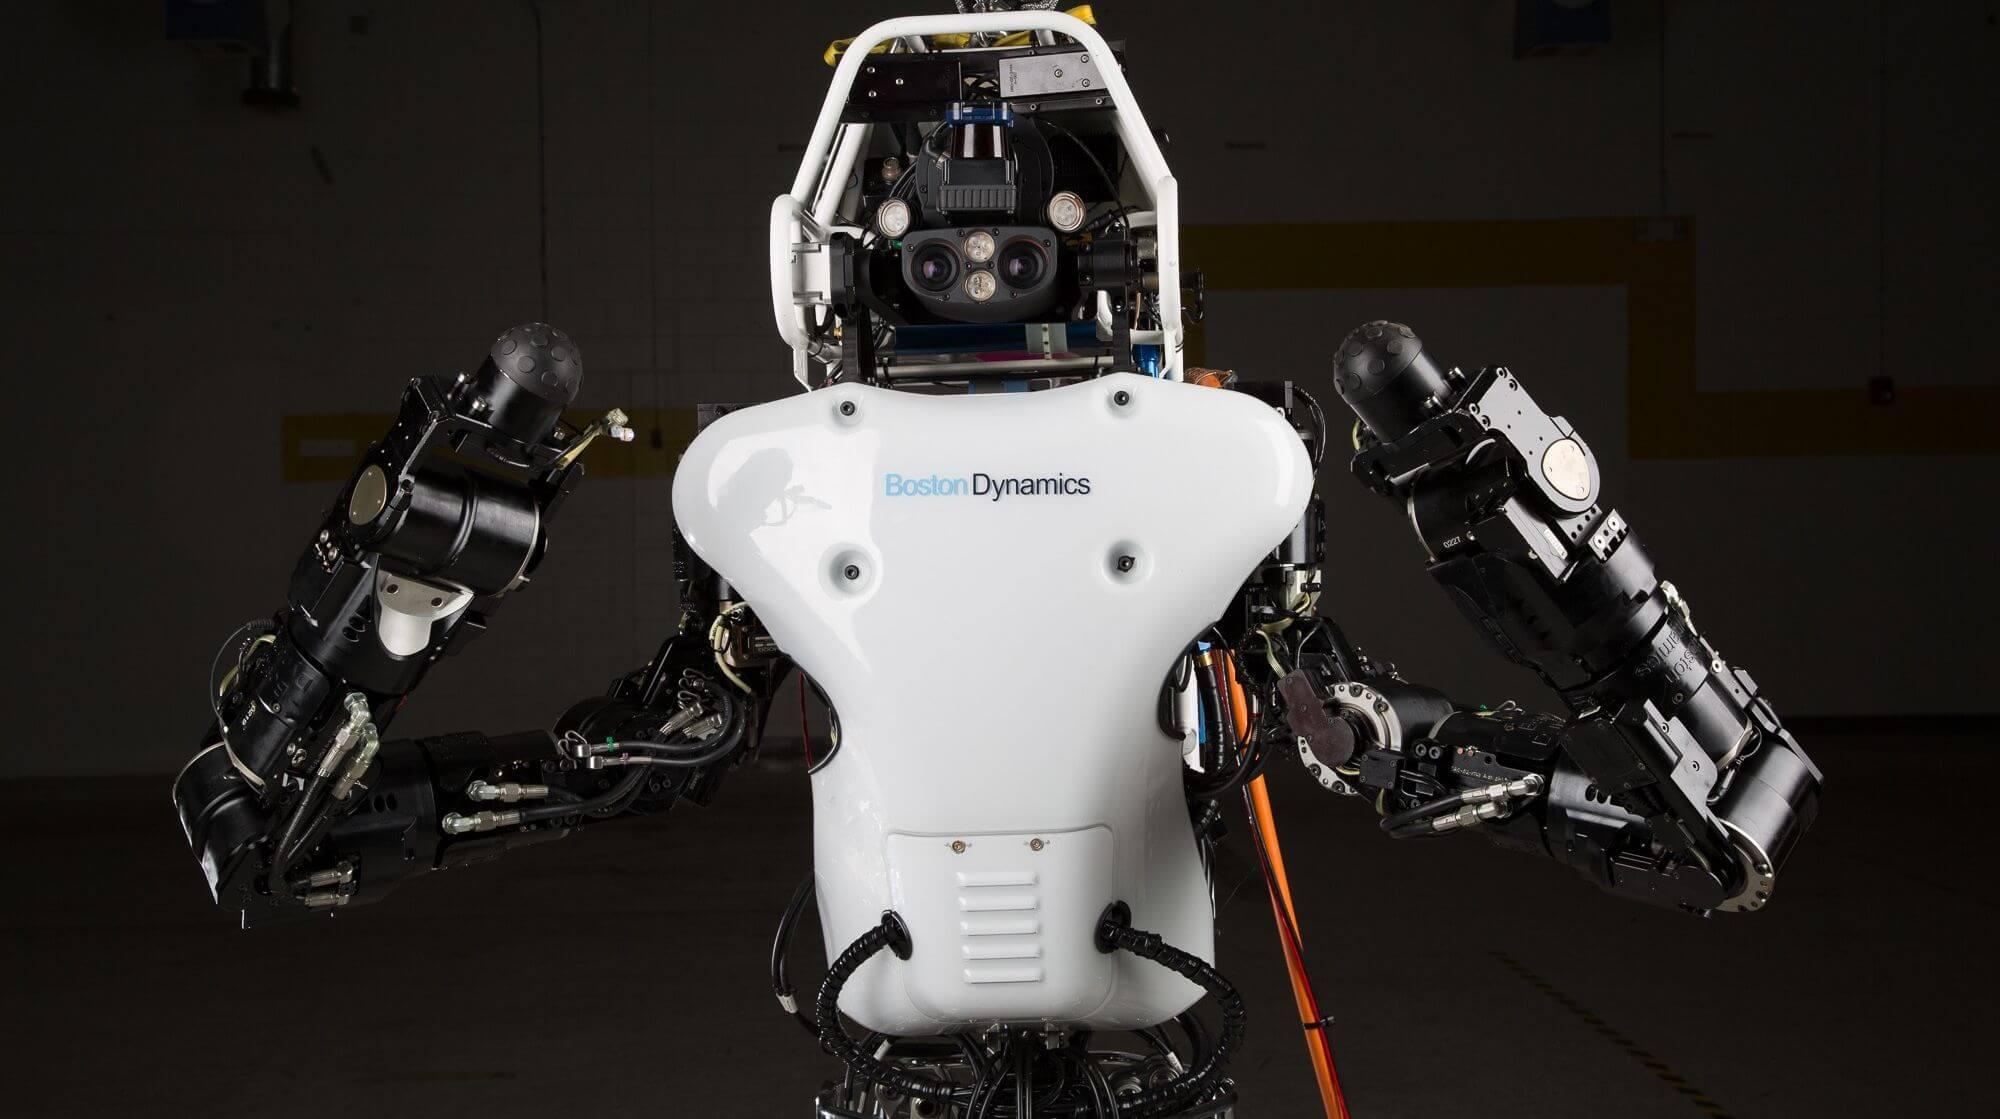 #видео дня | Boston Dynamics обучает робота Atlas основам паркура